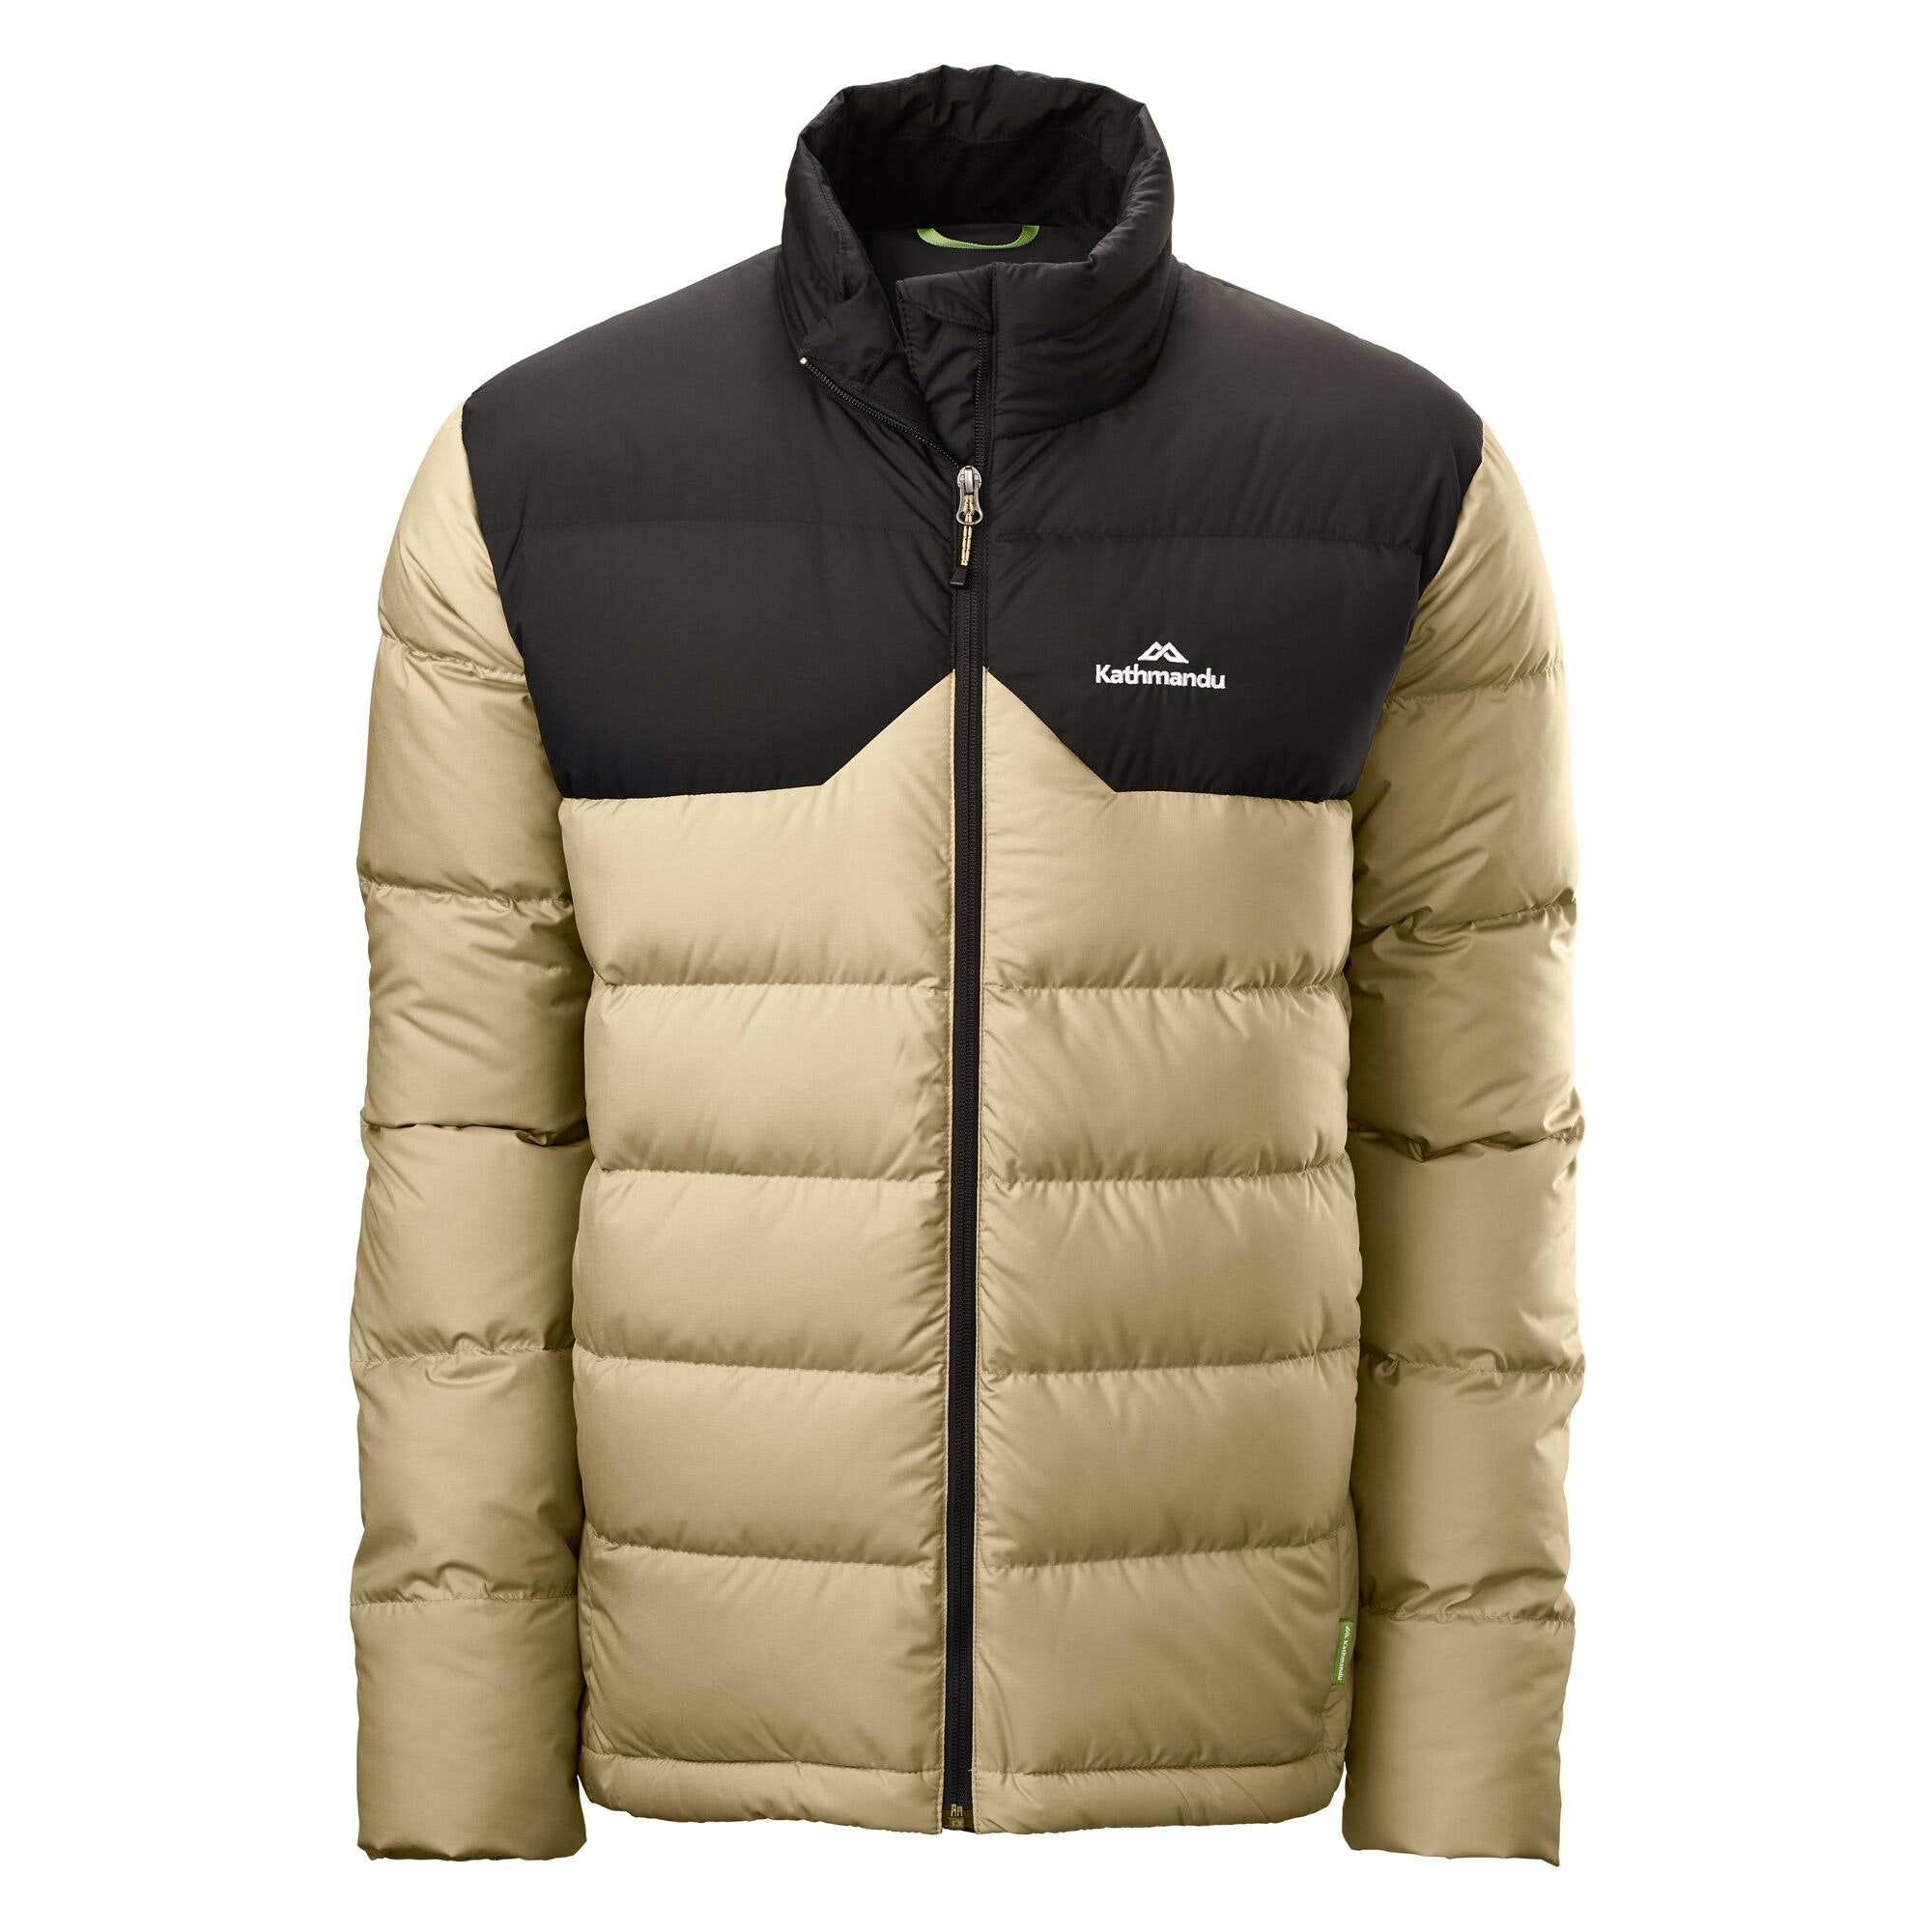 thumbnail 28 - NEW Kathmandu Epiq Mens 600 Fill Down Puffer Warm Outdoor Winter Jacket